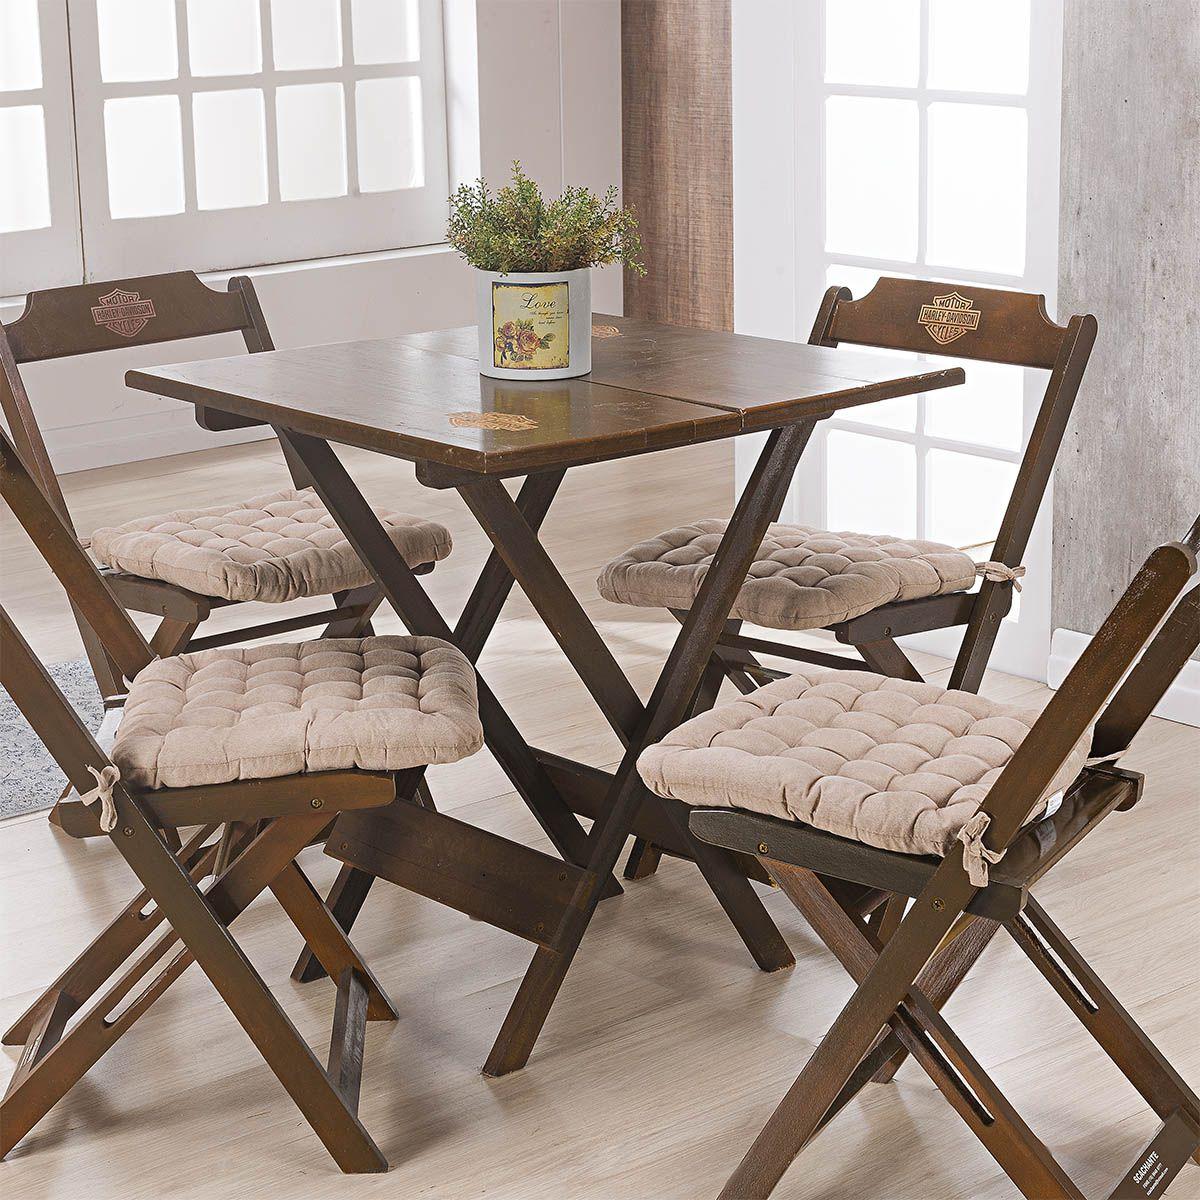 Kit C/ 4 - Assentos P/ Cadeira - Futton - Kalamar - 40cm x 40cm - Bege - Niazitex